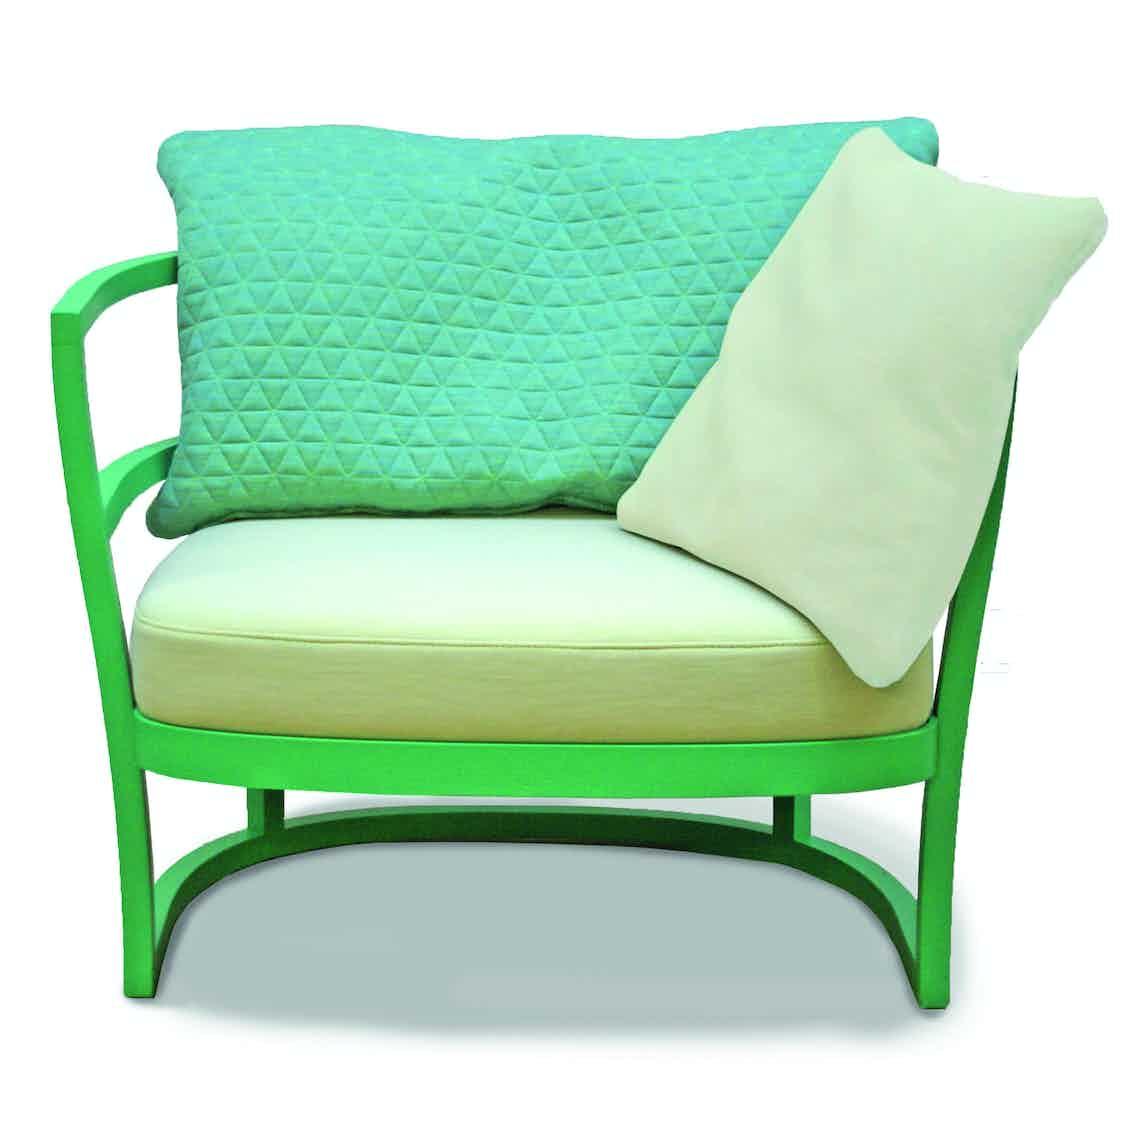 Dum-furniture-gree-wagner-haute-living